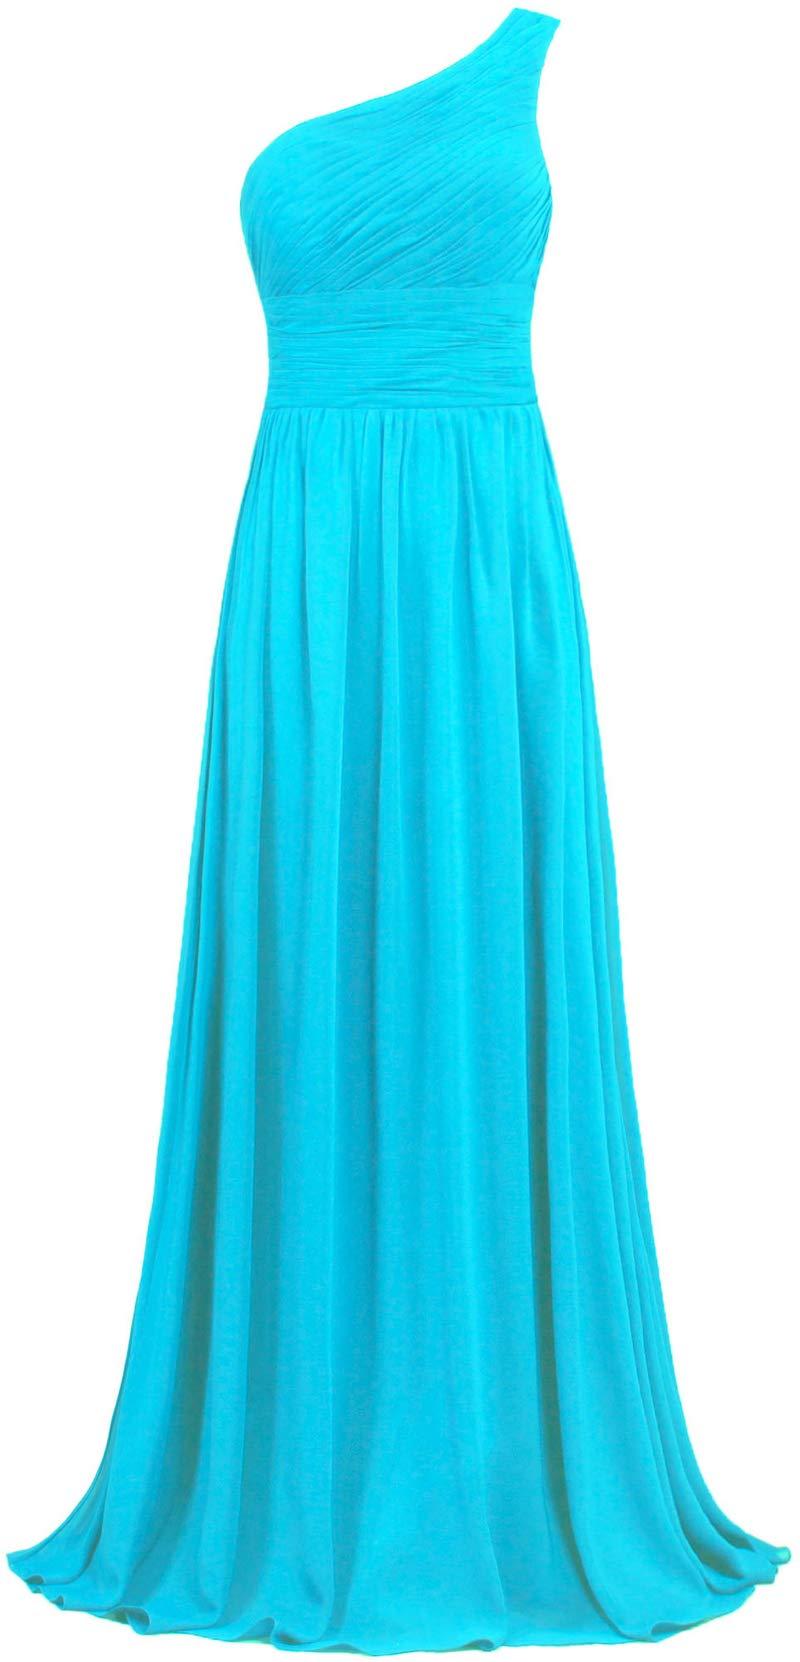 ANTS Women's Pleat Chiffon One Shoulder Bridesmaid Dresses Long Evening Gown Size 2 US Turquoise